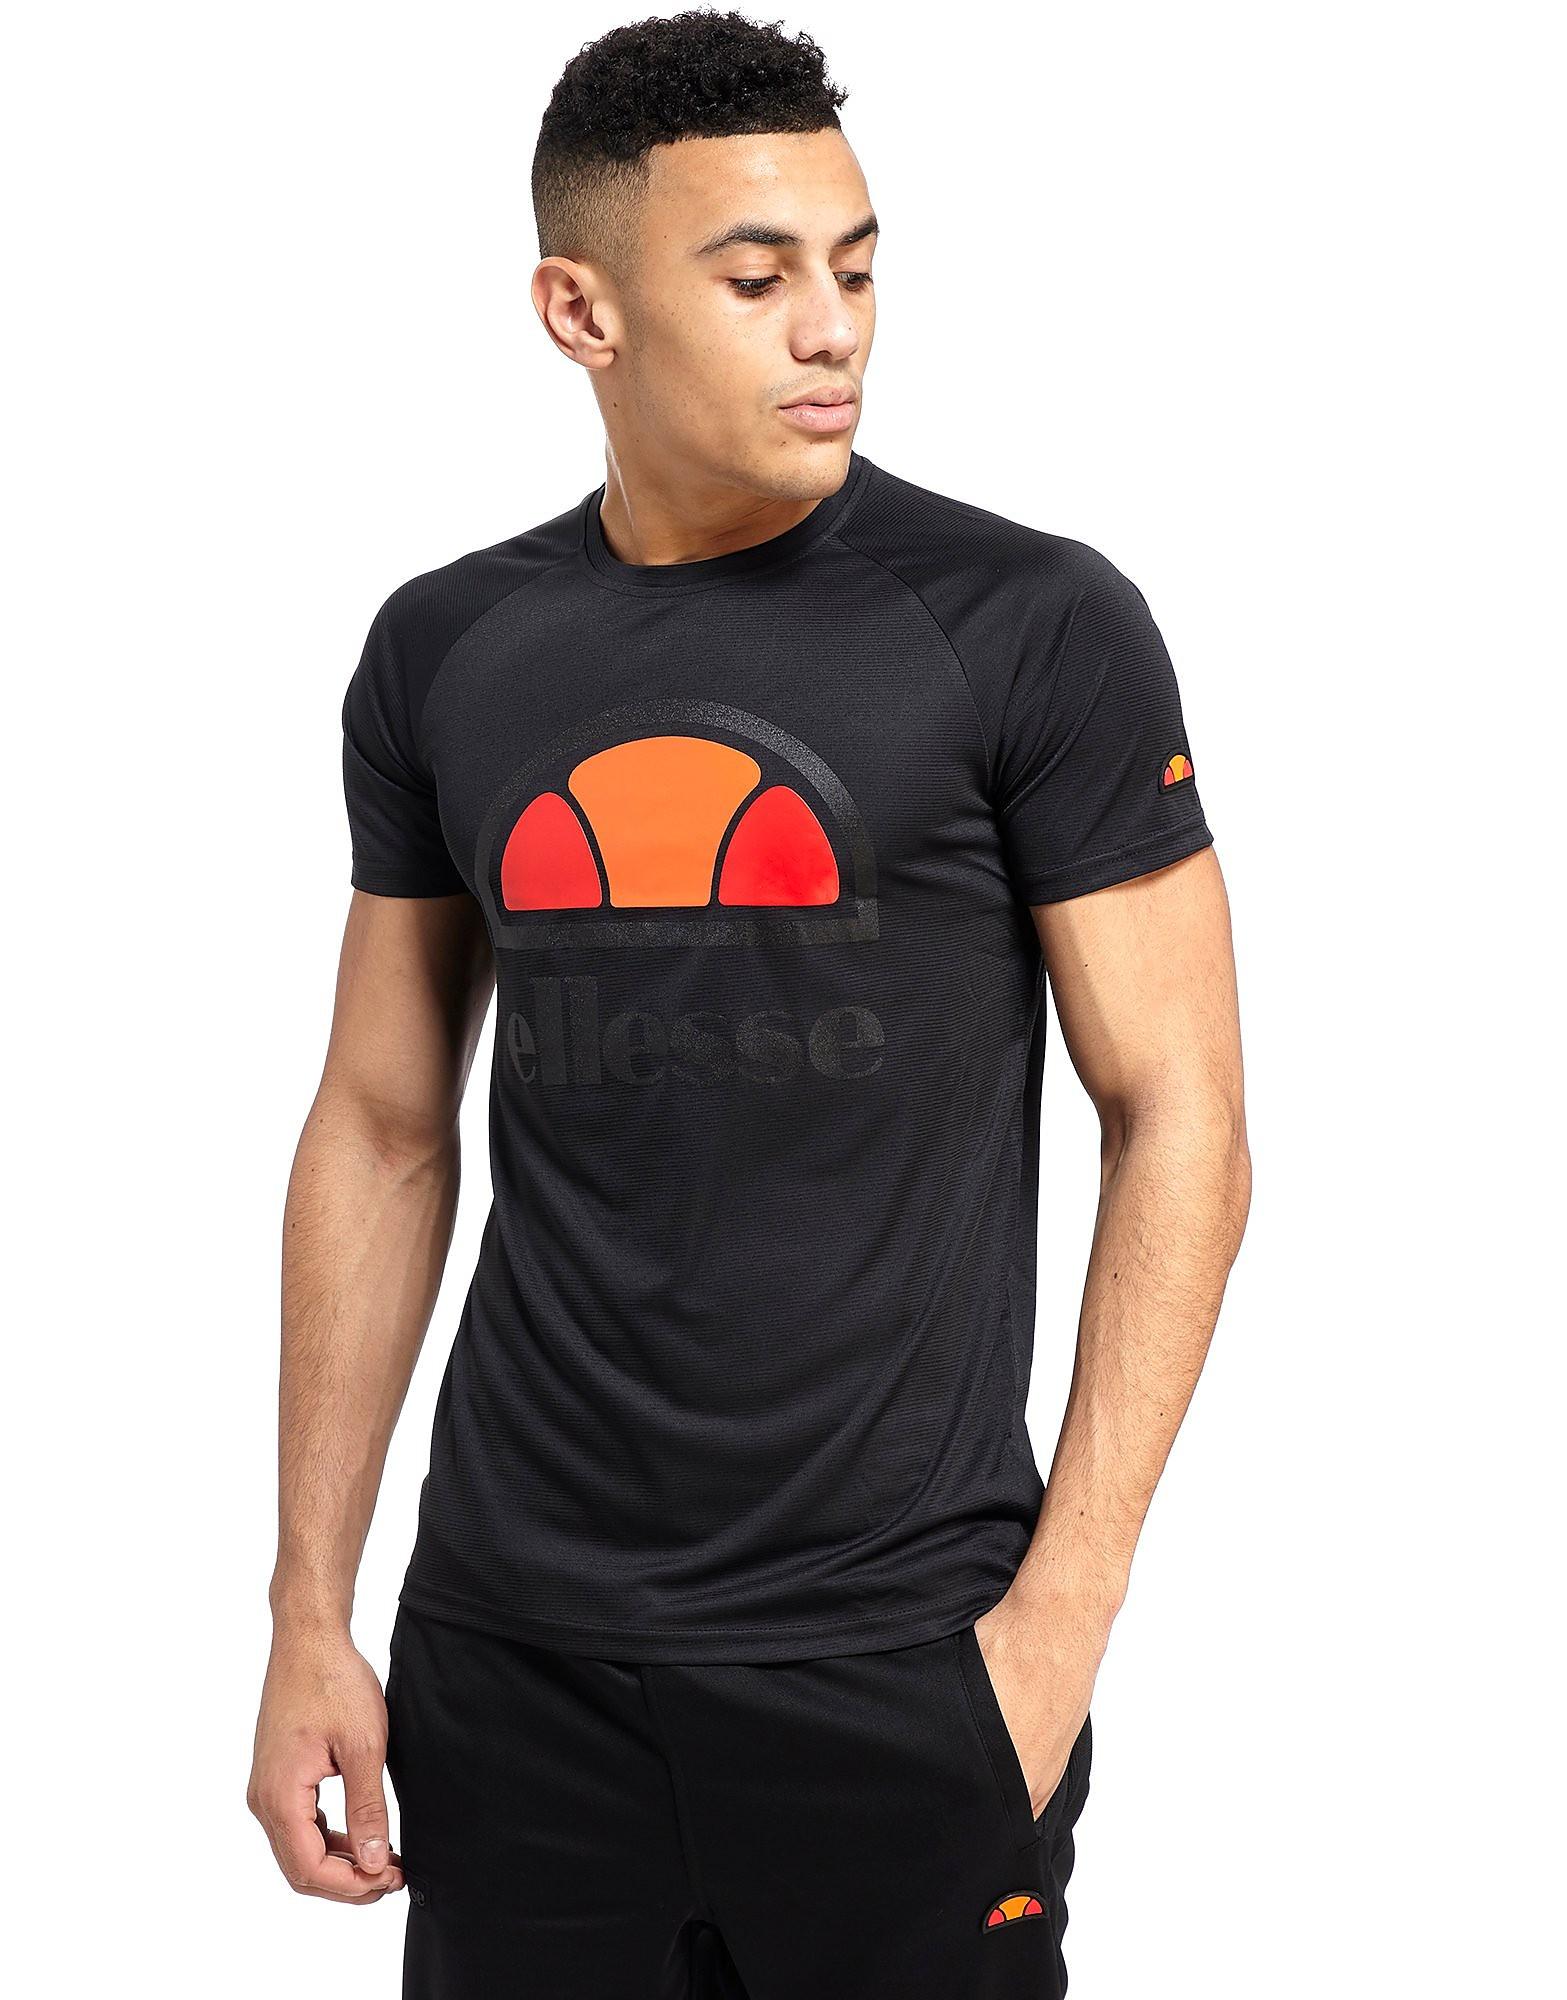 Ellesse Ruona T-Shirt Homme